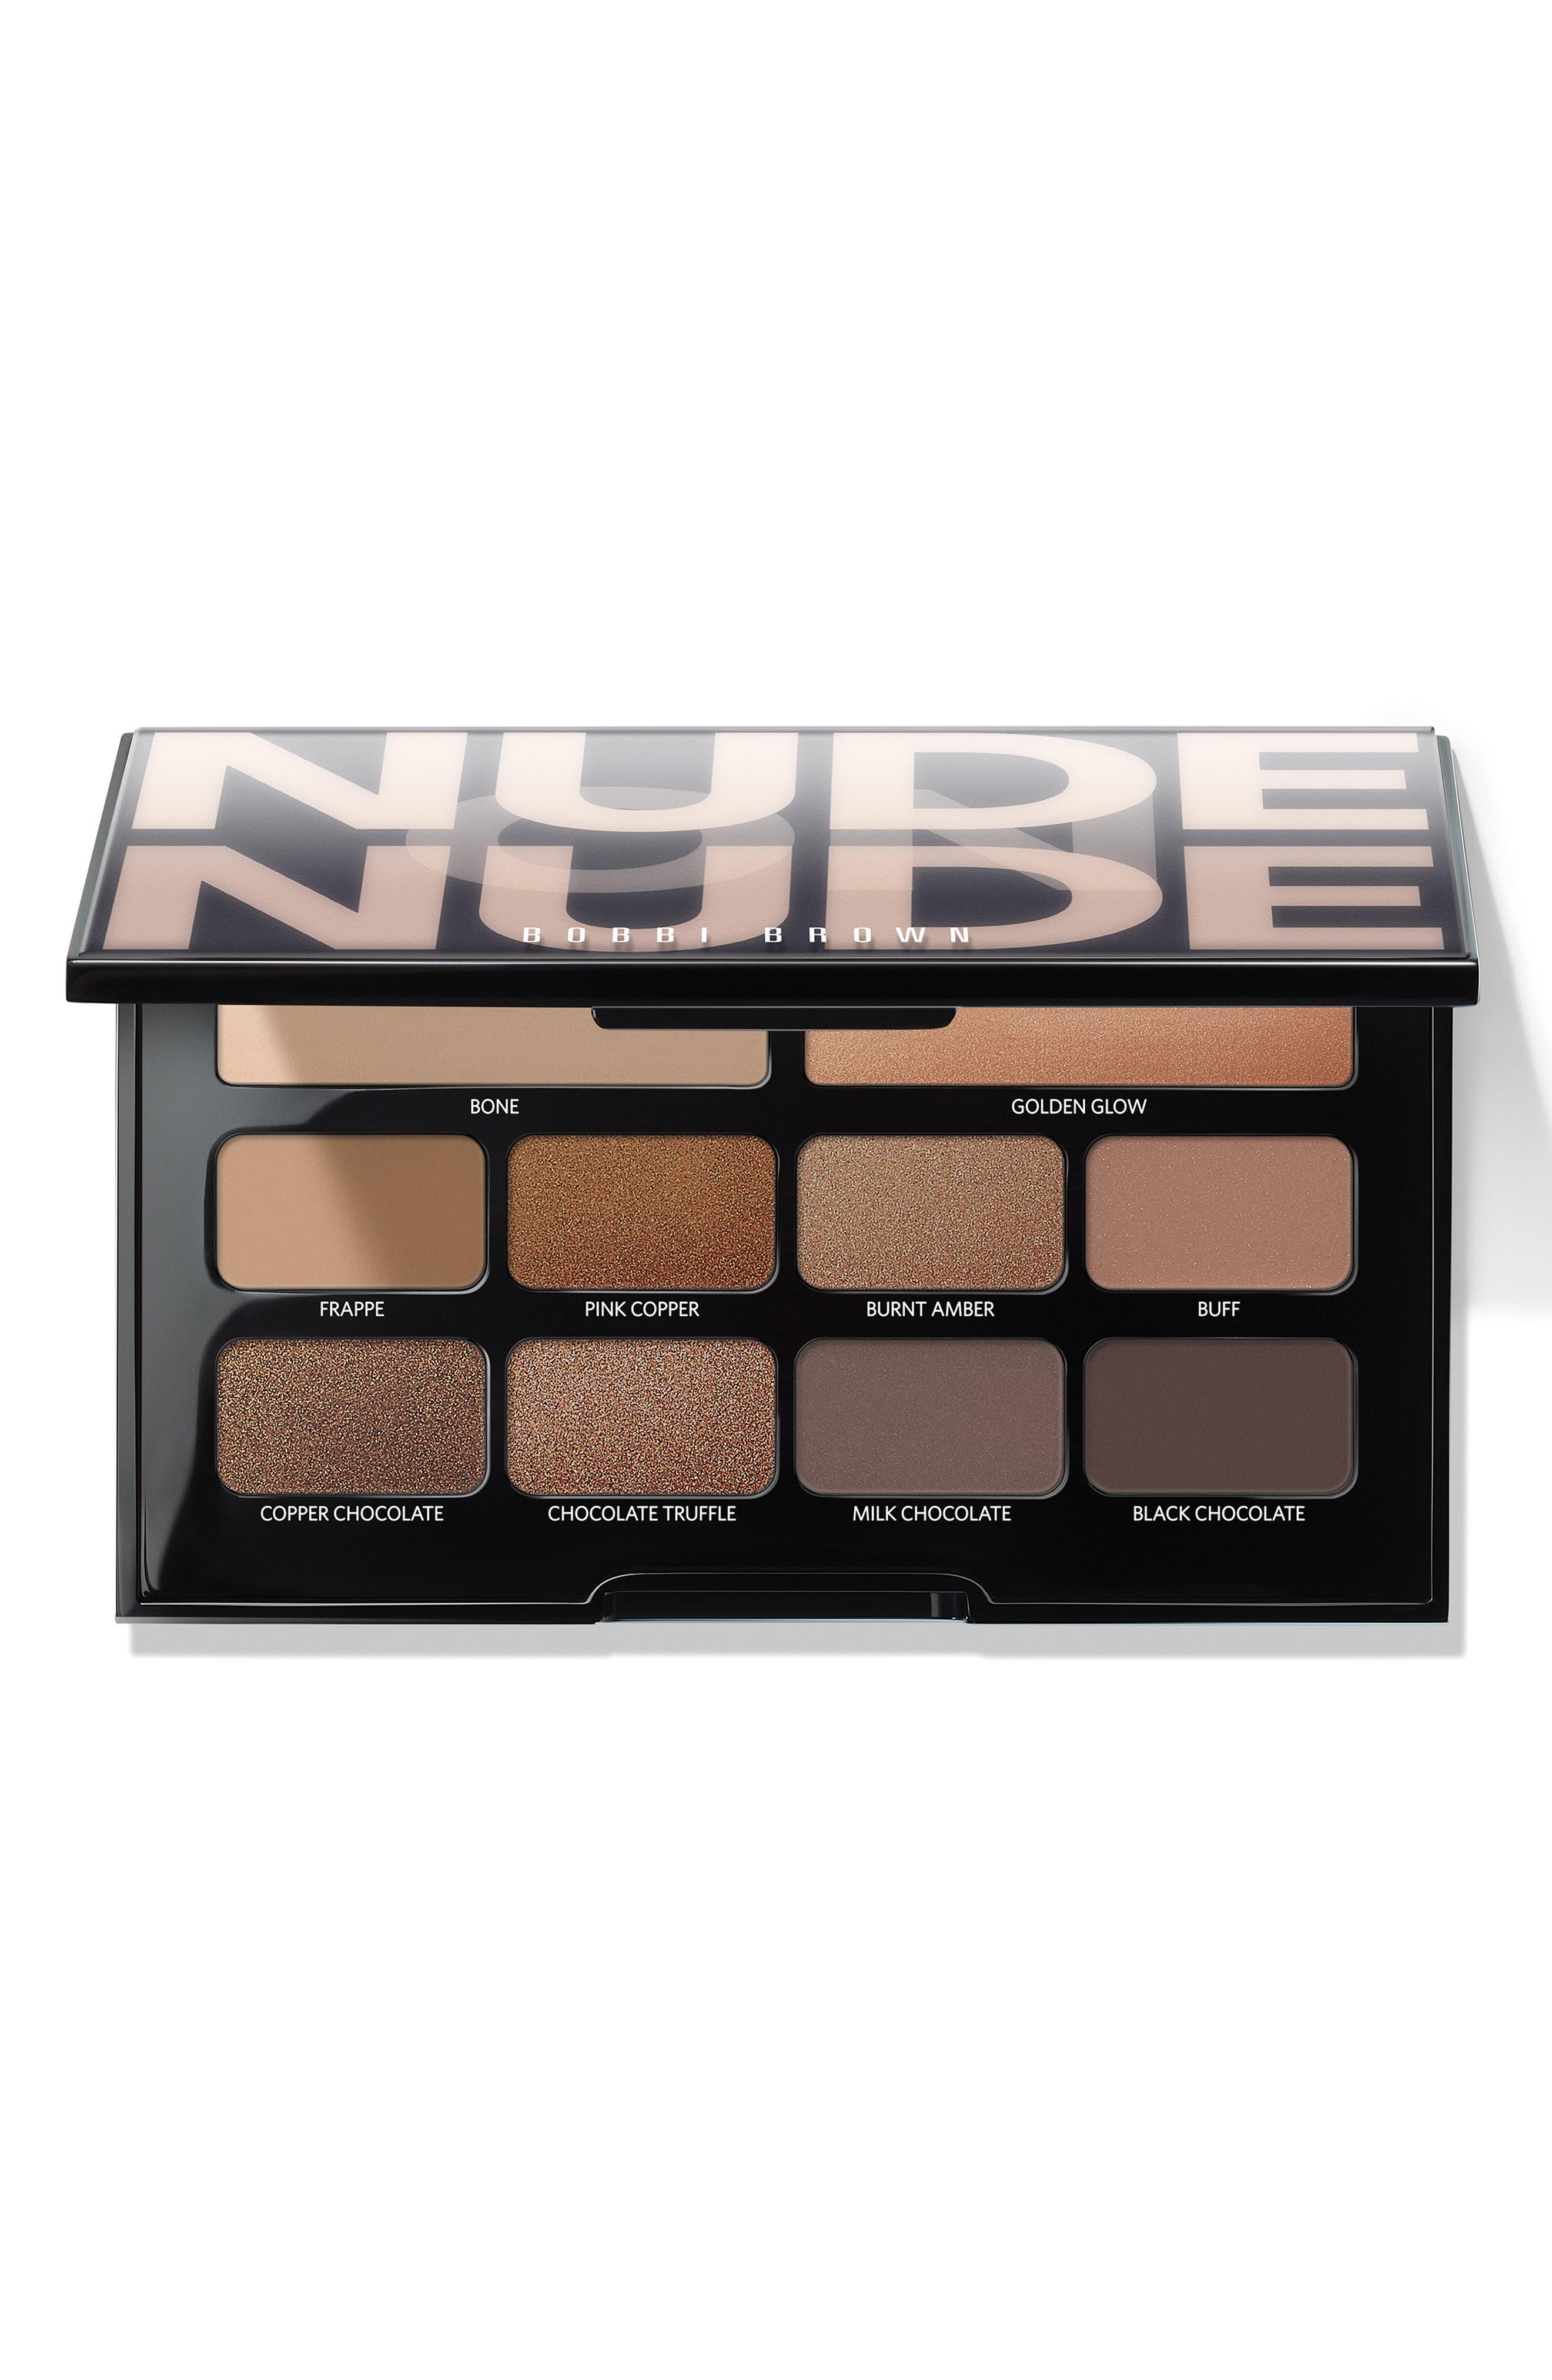 BOBBI BROWN, Nude on Nude Eyeshadow Palette, Main thumbnail 1, color, 200